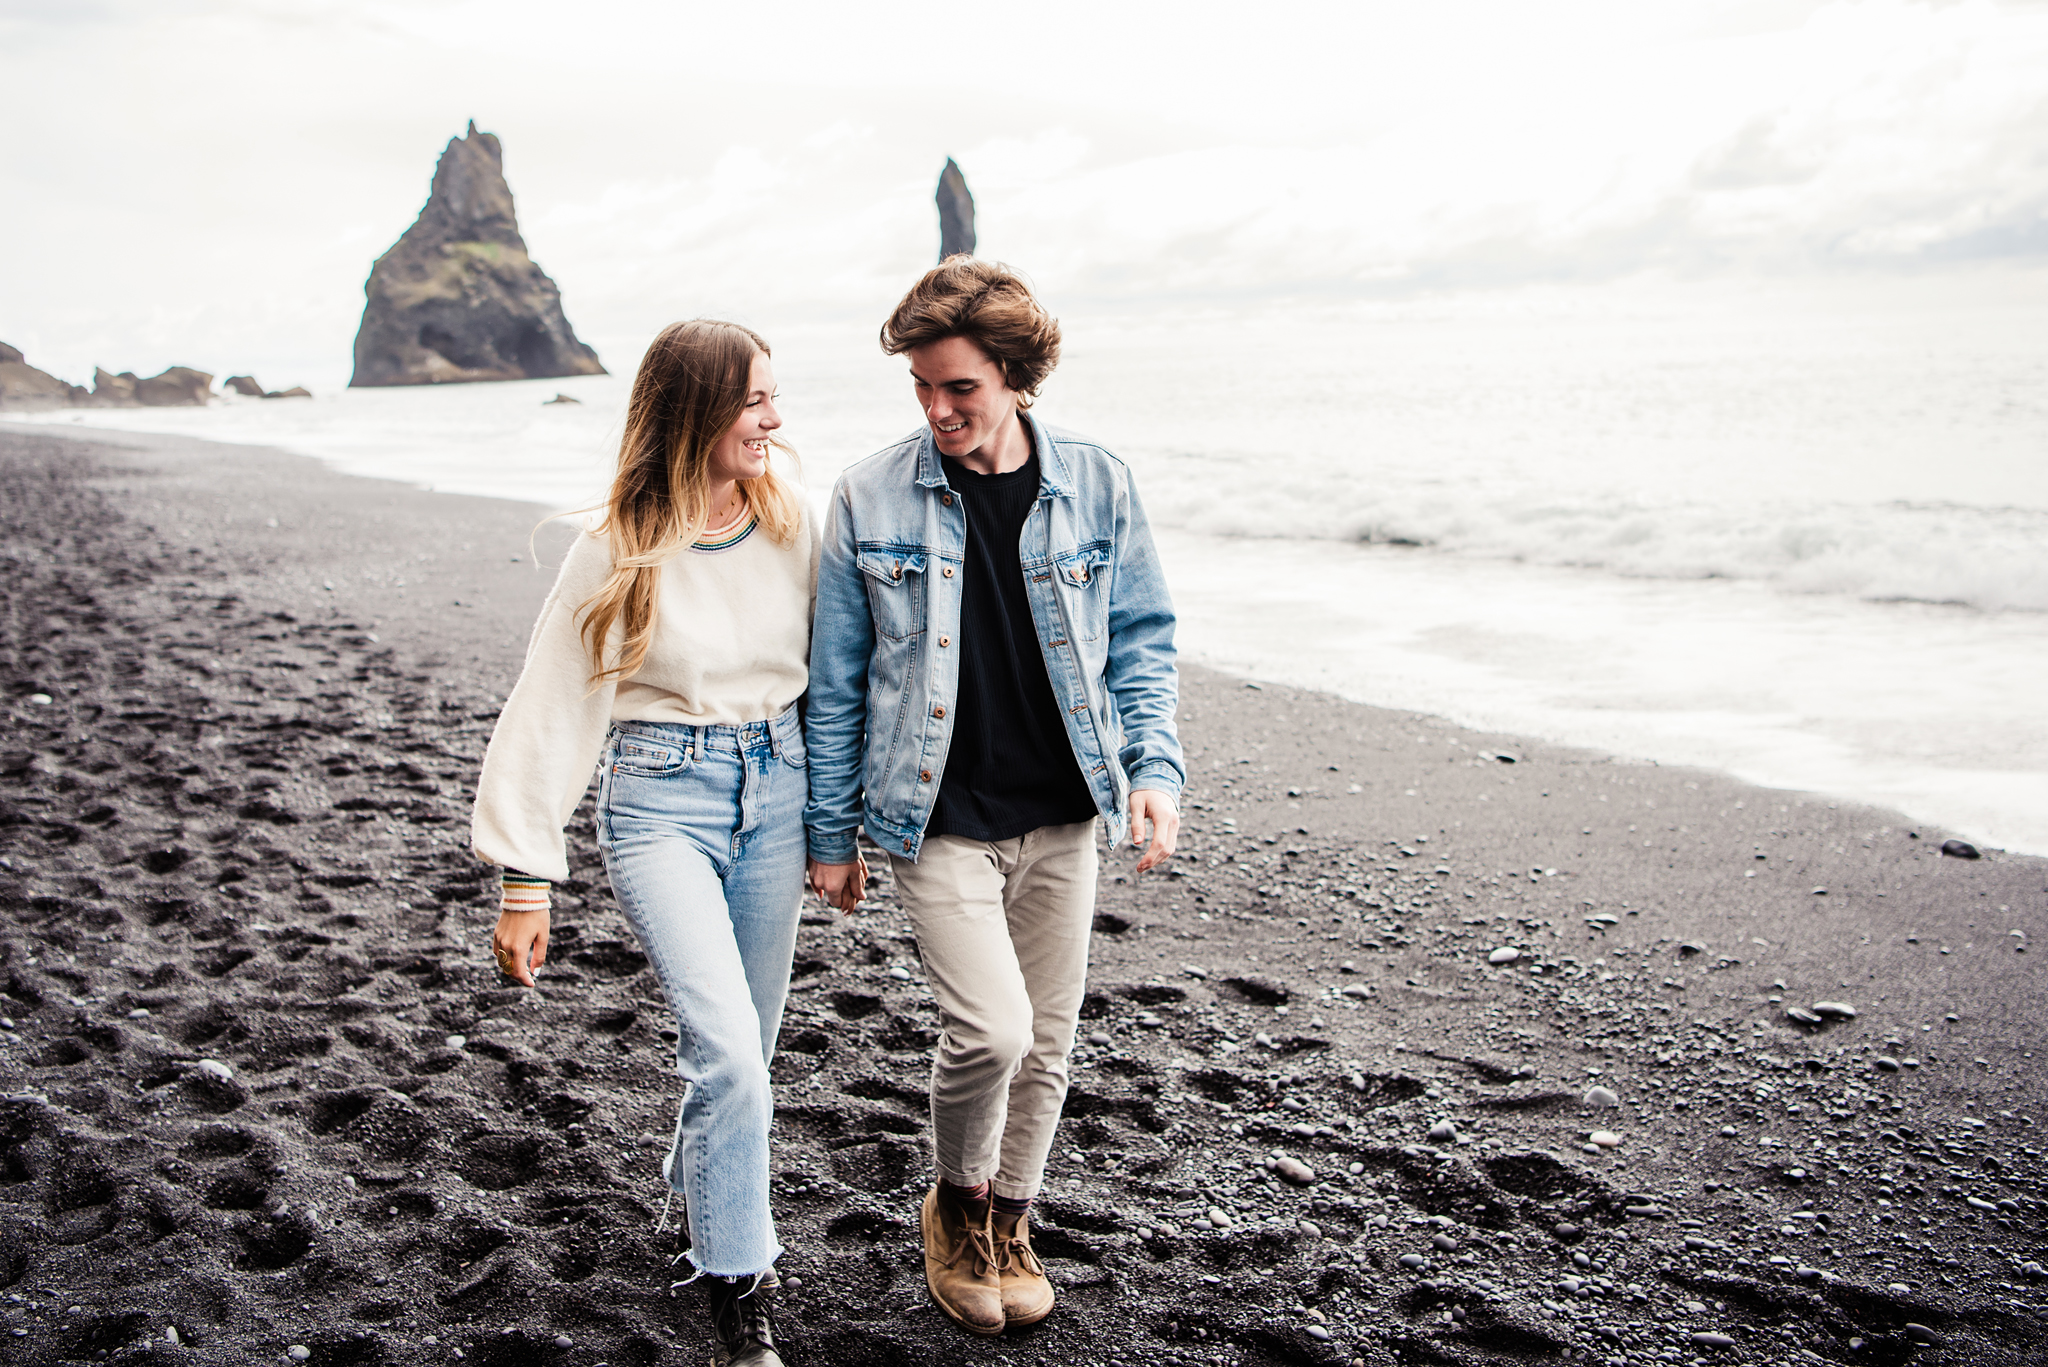 Iceland_Reynisfjara_Black_Sand_Beach_Couples_Session_JILL_STUDIO_Rochester_NY_Photographer_DSC_9793.jpg